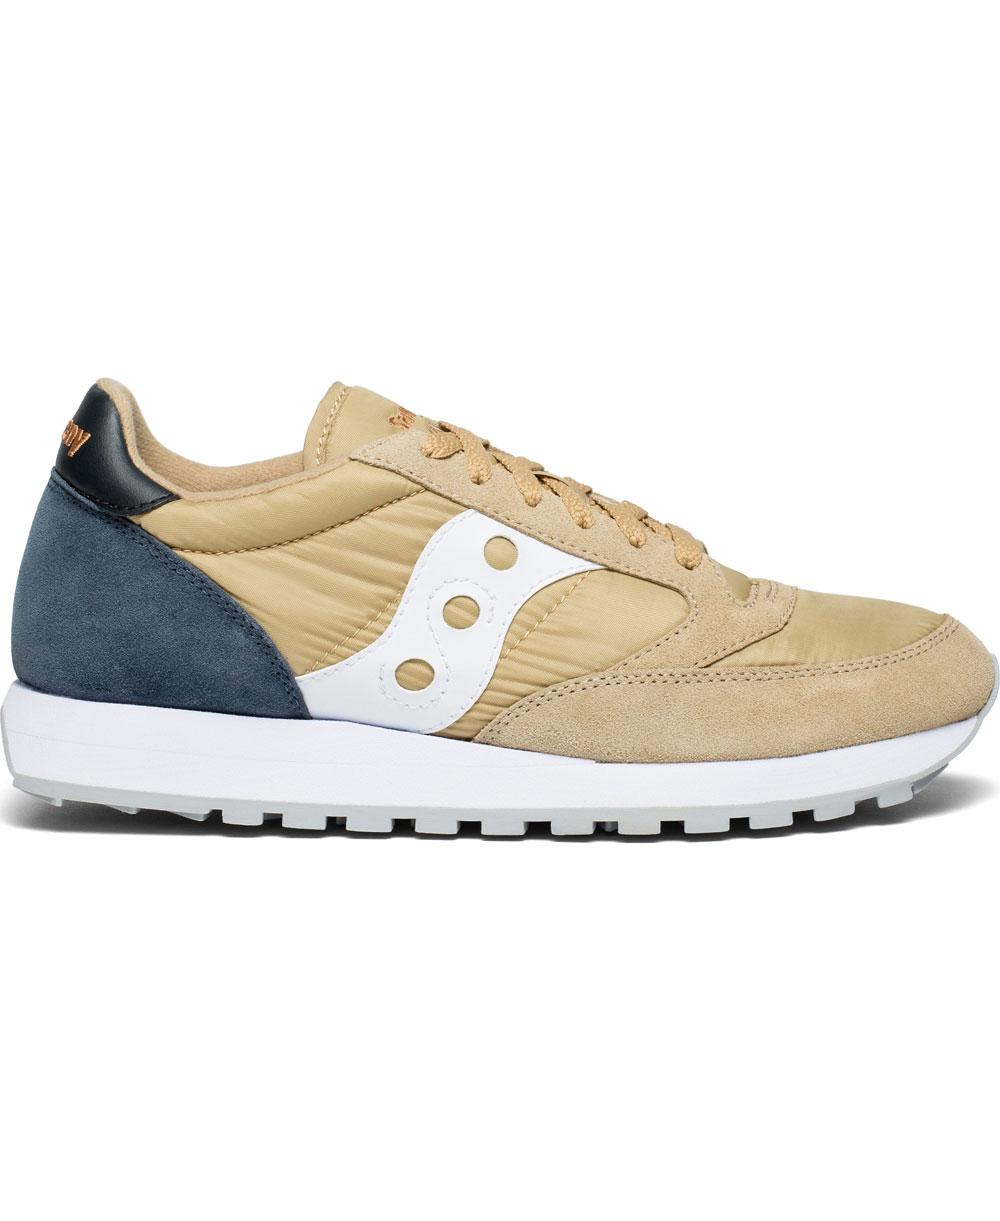 promo code 6e213 19e4e Herren Sneakers Jazz Original Schuhe Tan/Navy